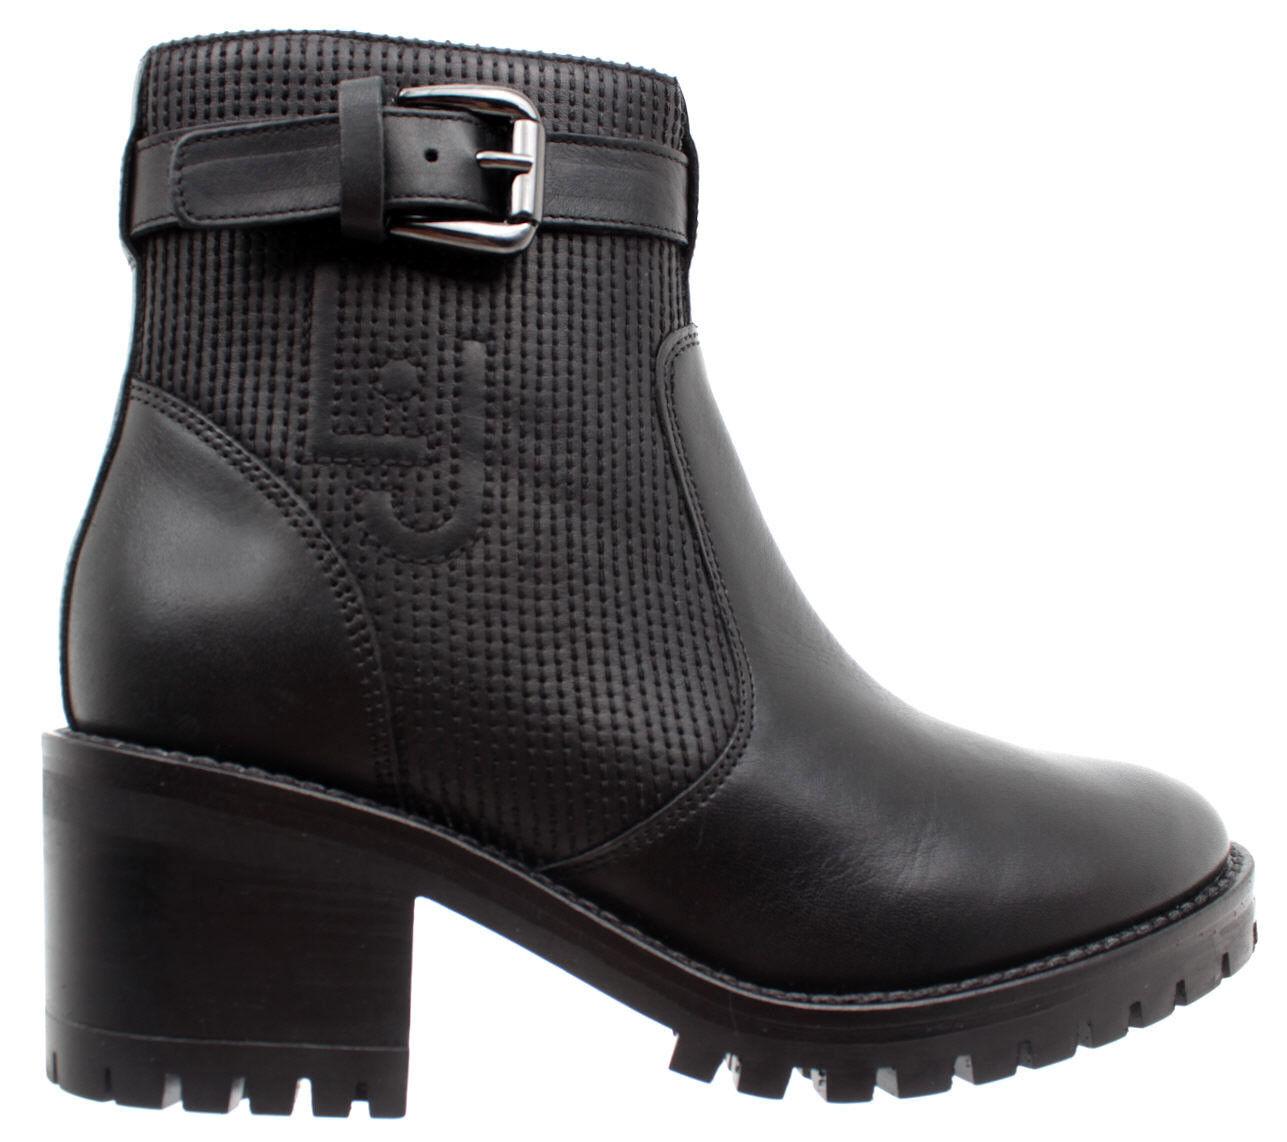 LIU JO Zapatos Mujeres botas Tina 02 botay Claf Leather negro Piel Negro Nuevos